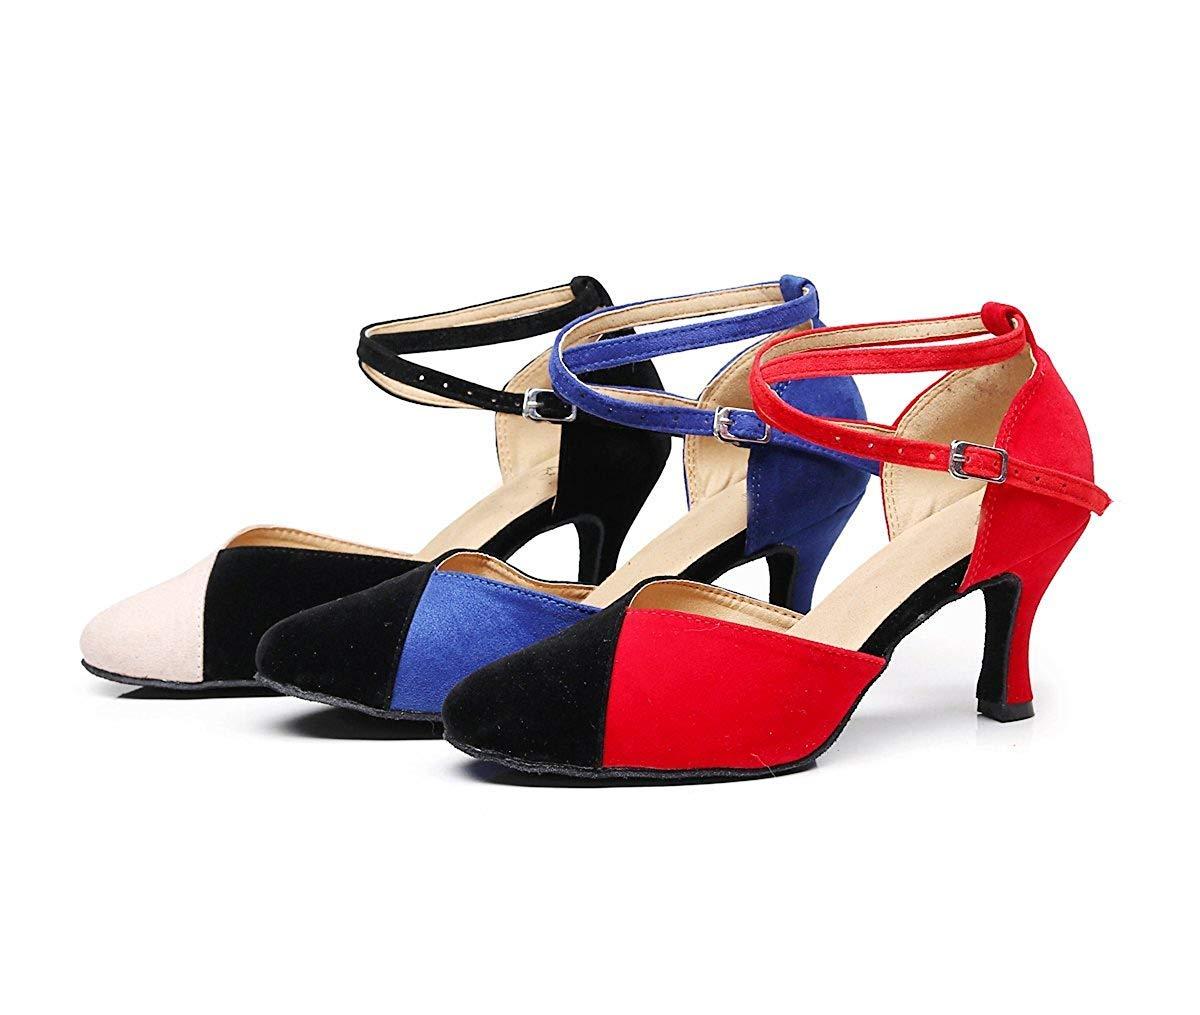 Qiusa TJ7136 TJ7136 TJ7136 Damen Mädchen Knöchelriemen Blau Wildleder Latin Dancing Schuhe Formale Partei Pumps UK 2,5 (Farbe   - Größe   -) 9d6ad4